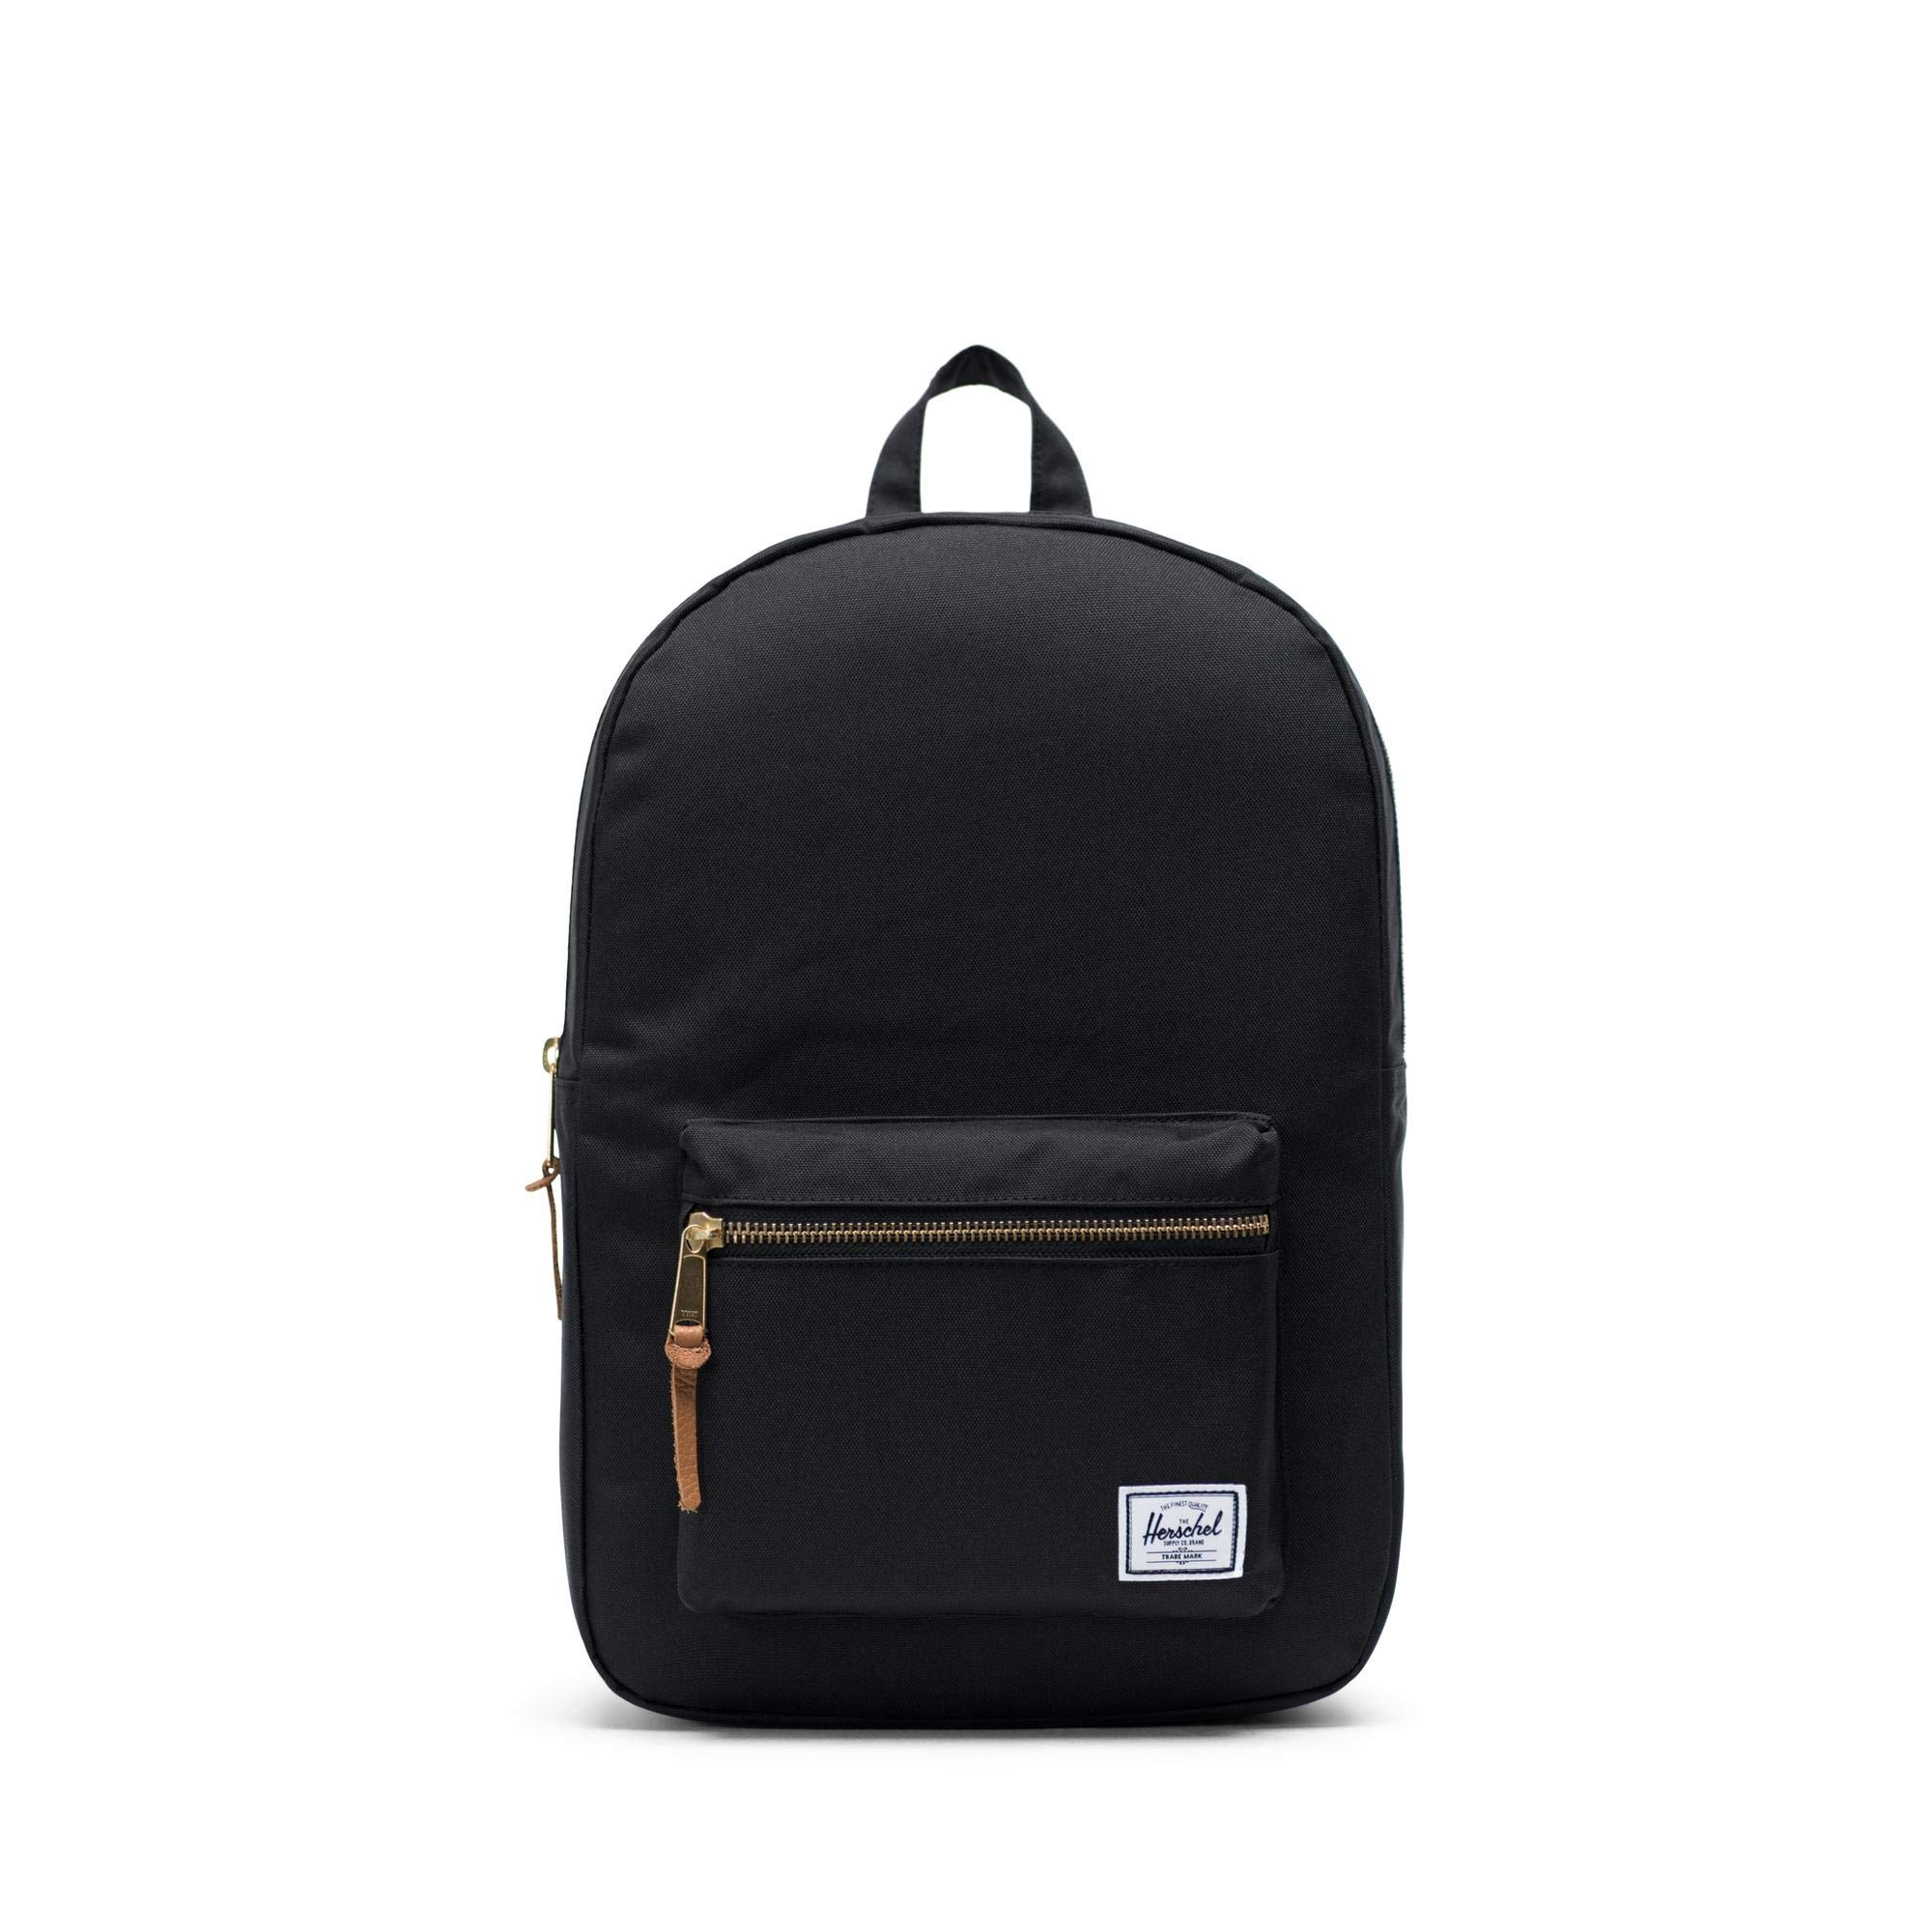 Herschel Supply Settlement Mid-Volume Backpack, Black, One Size